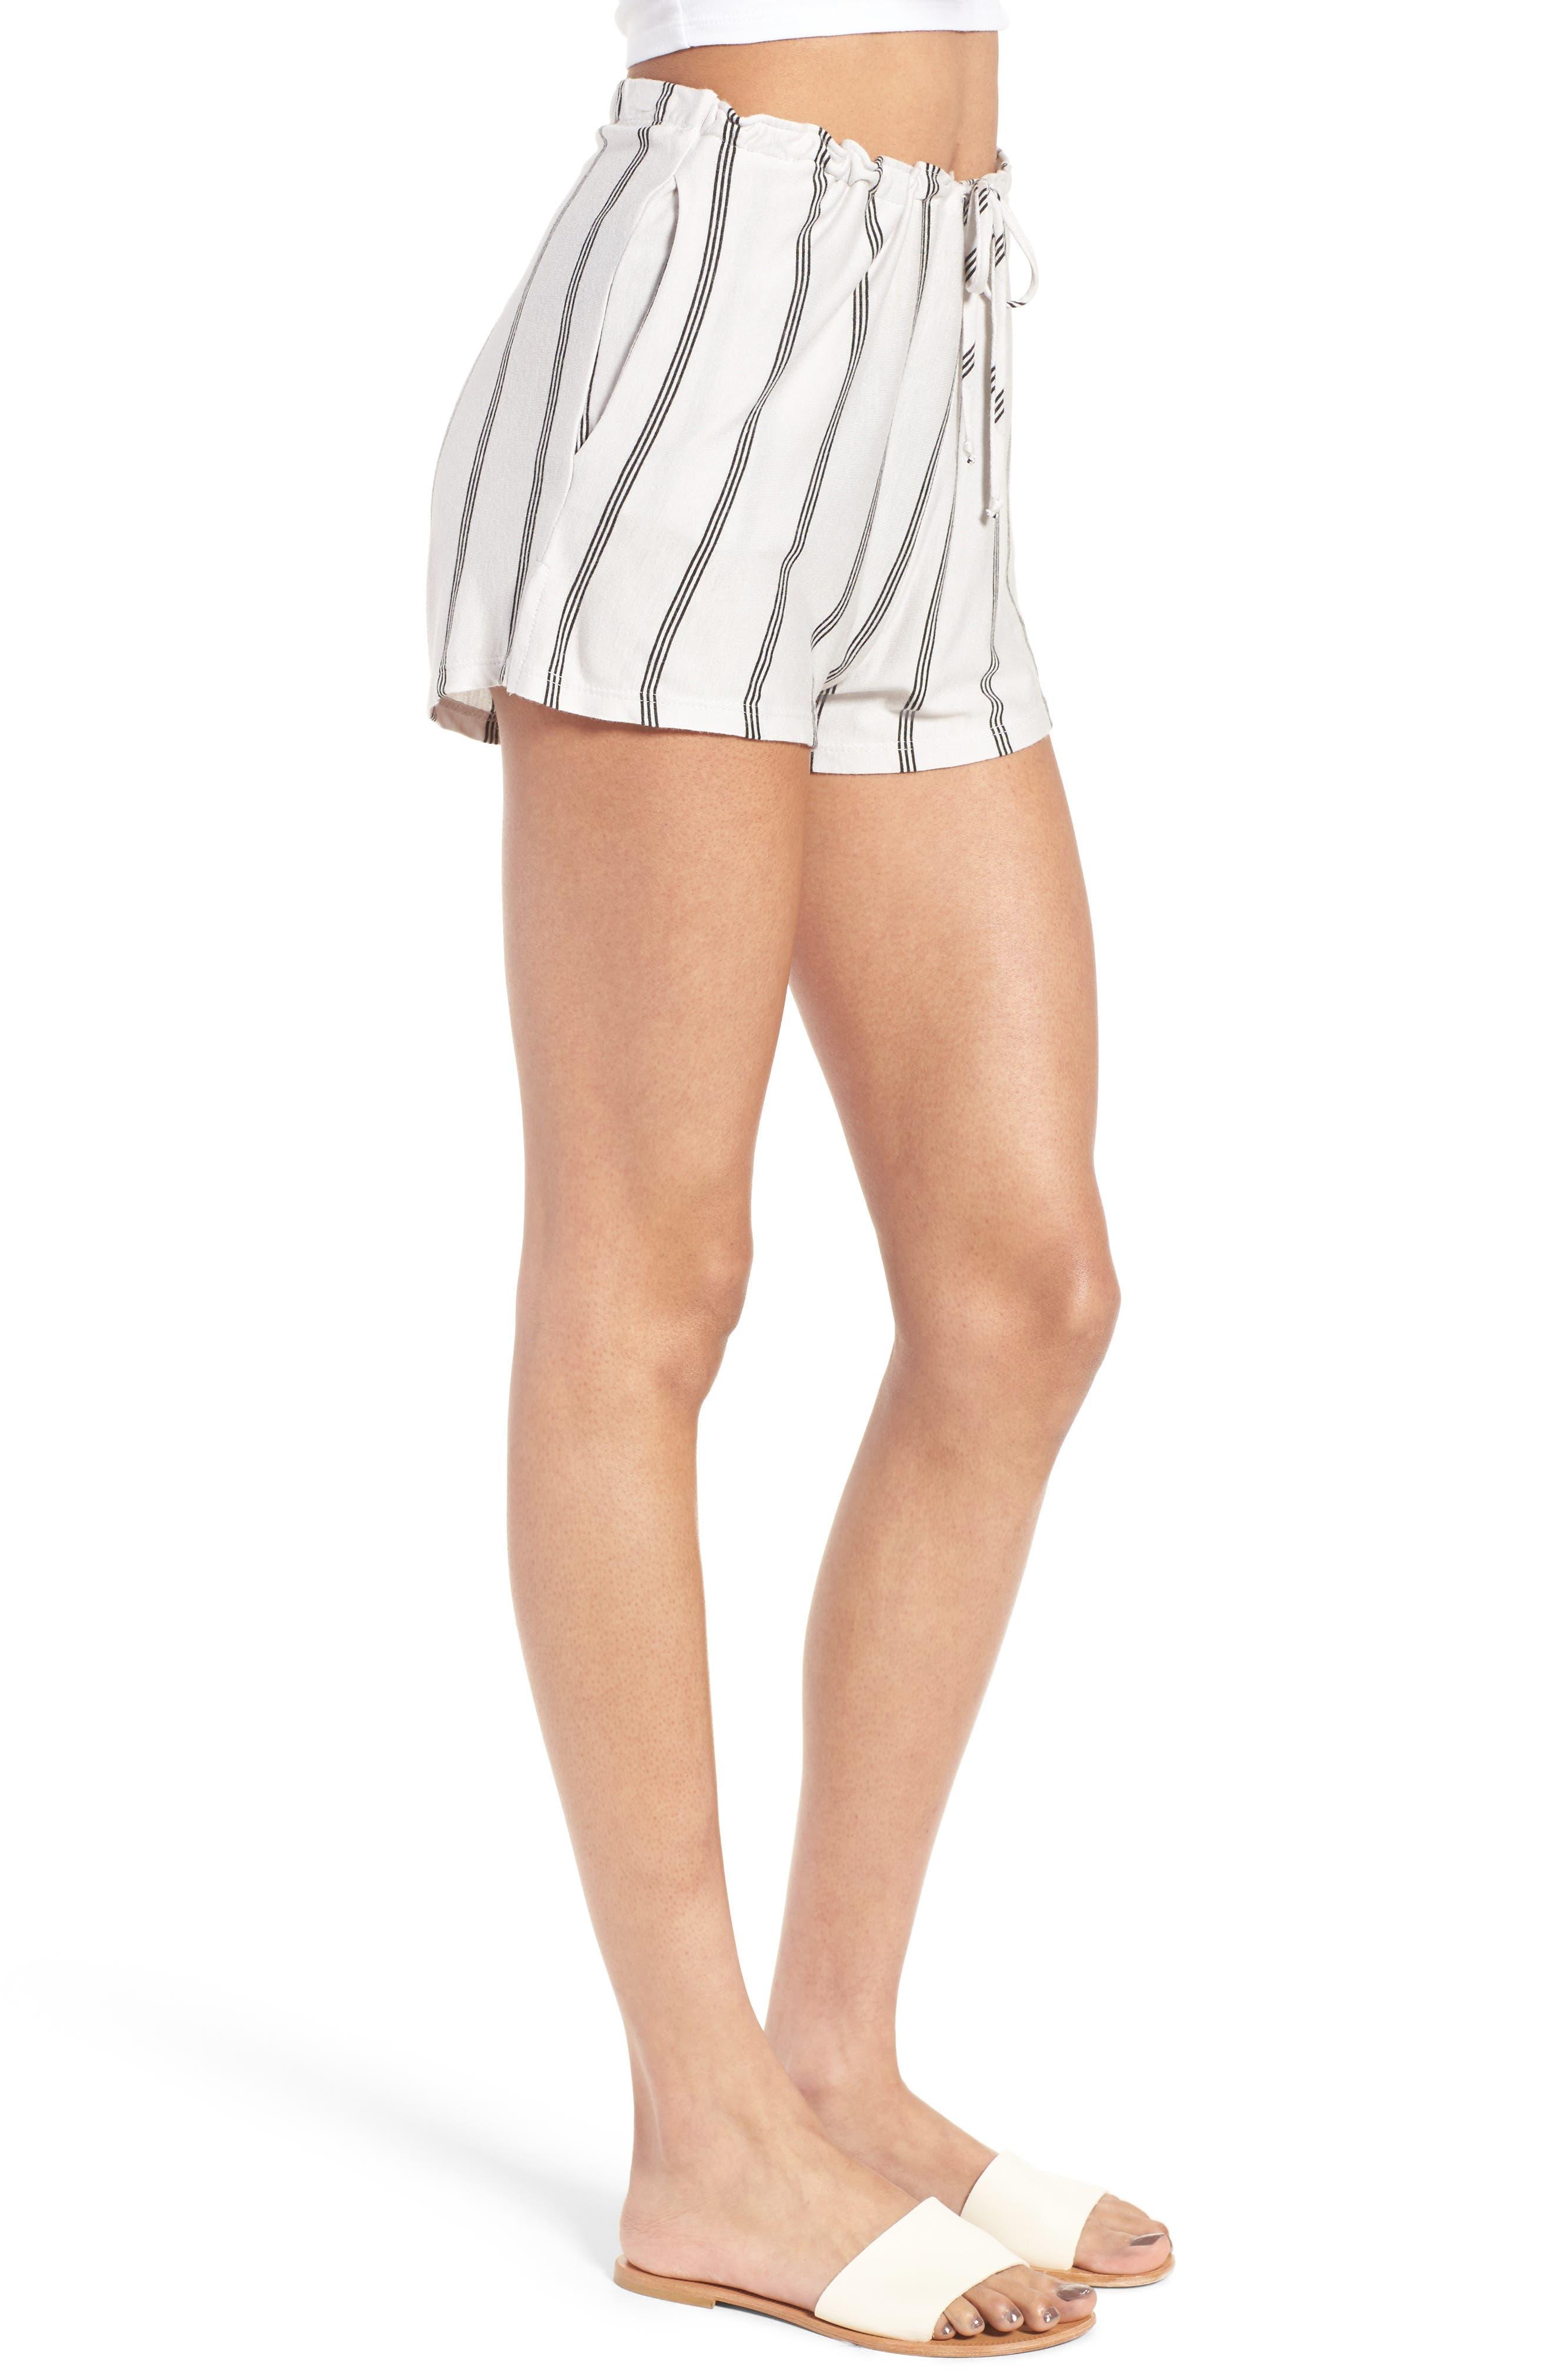 Alternate Image 3  - Michelle by Comune Reklaw Stripe Shorts